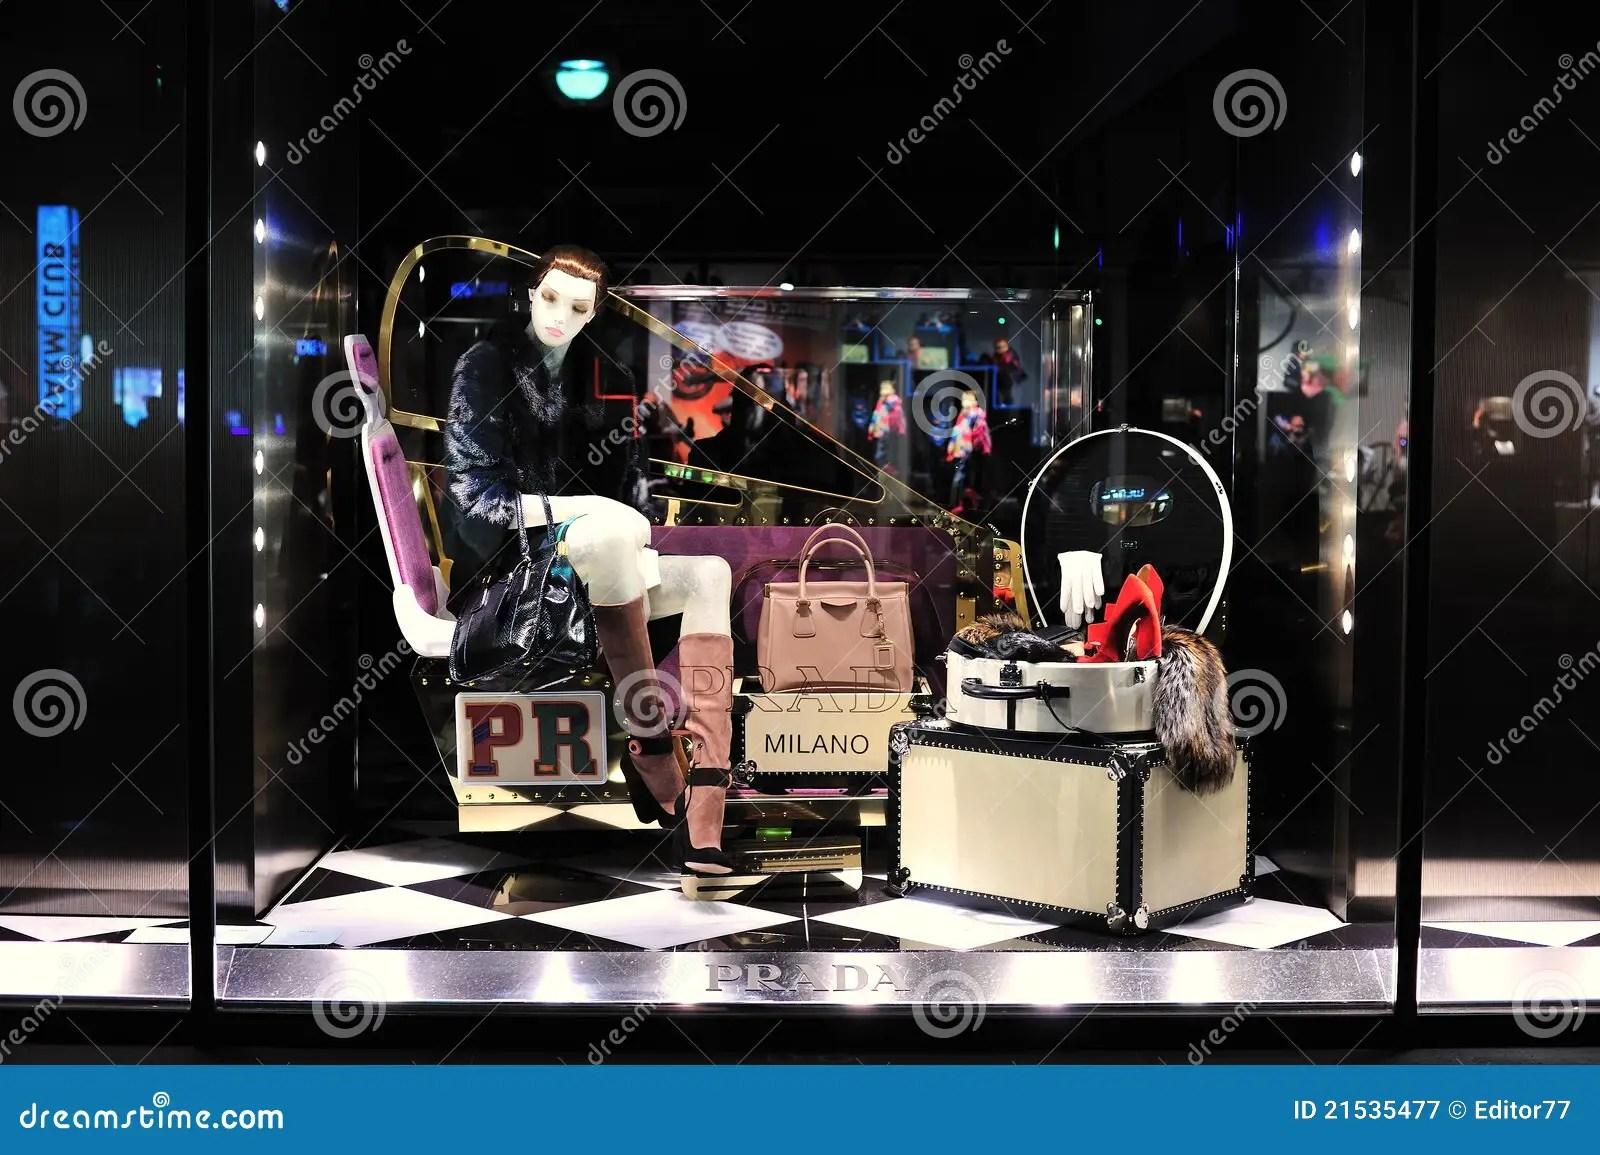 Prada Luxury Fashion Store Editorial Photography Image